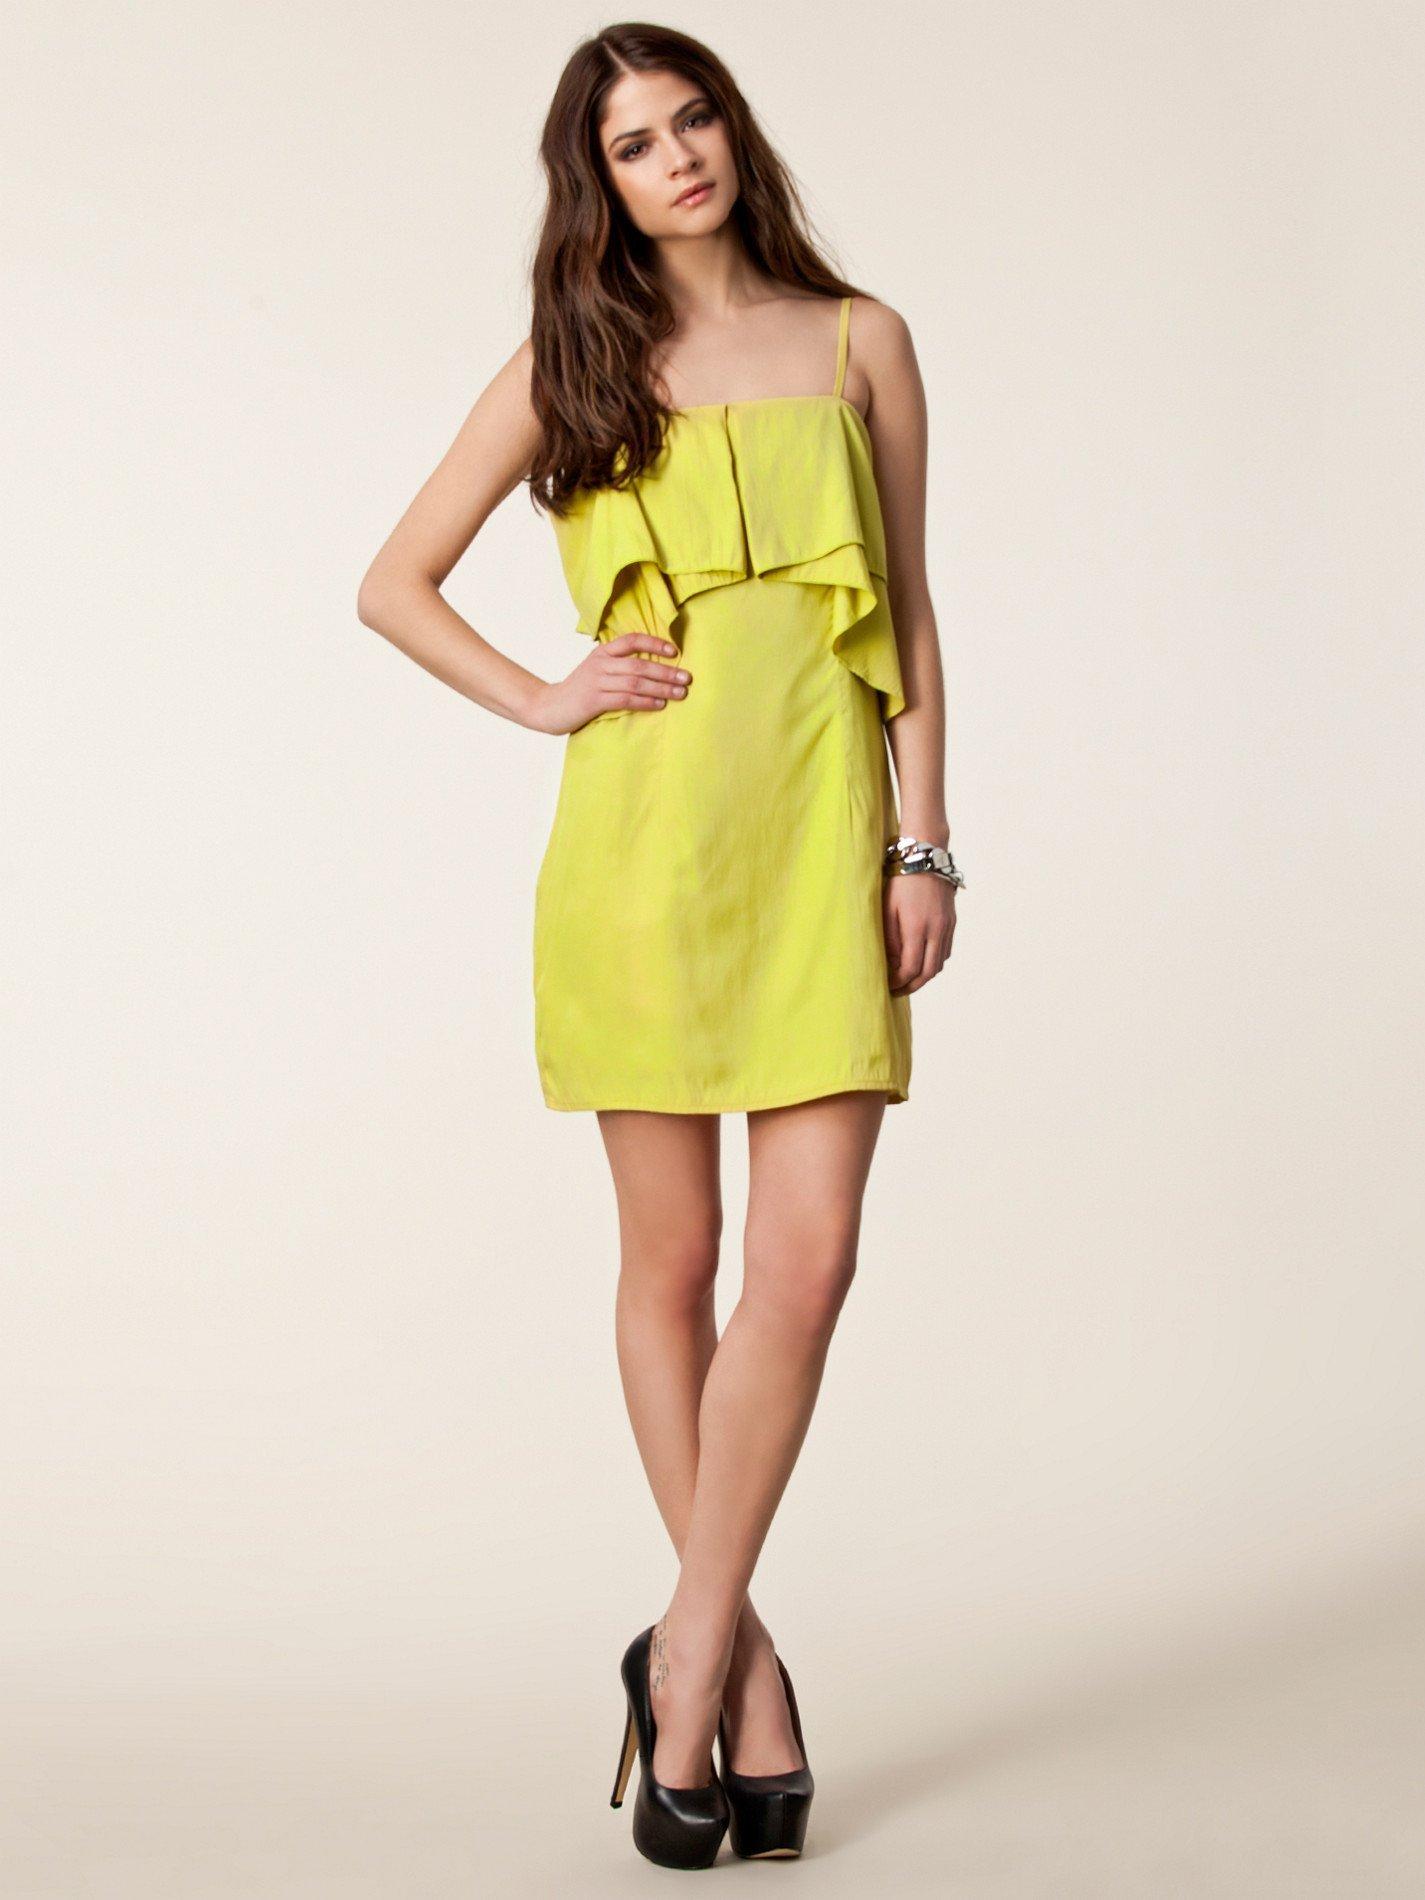 yellow-dress-2